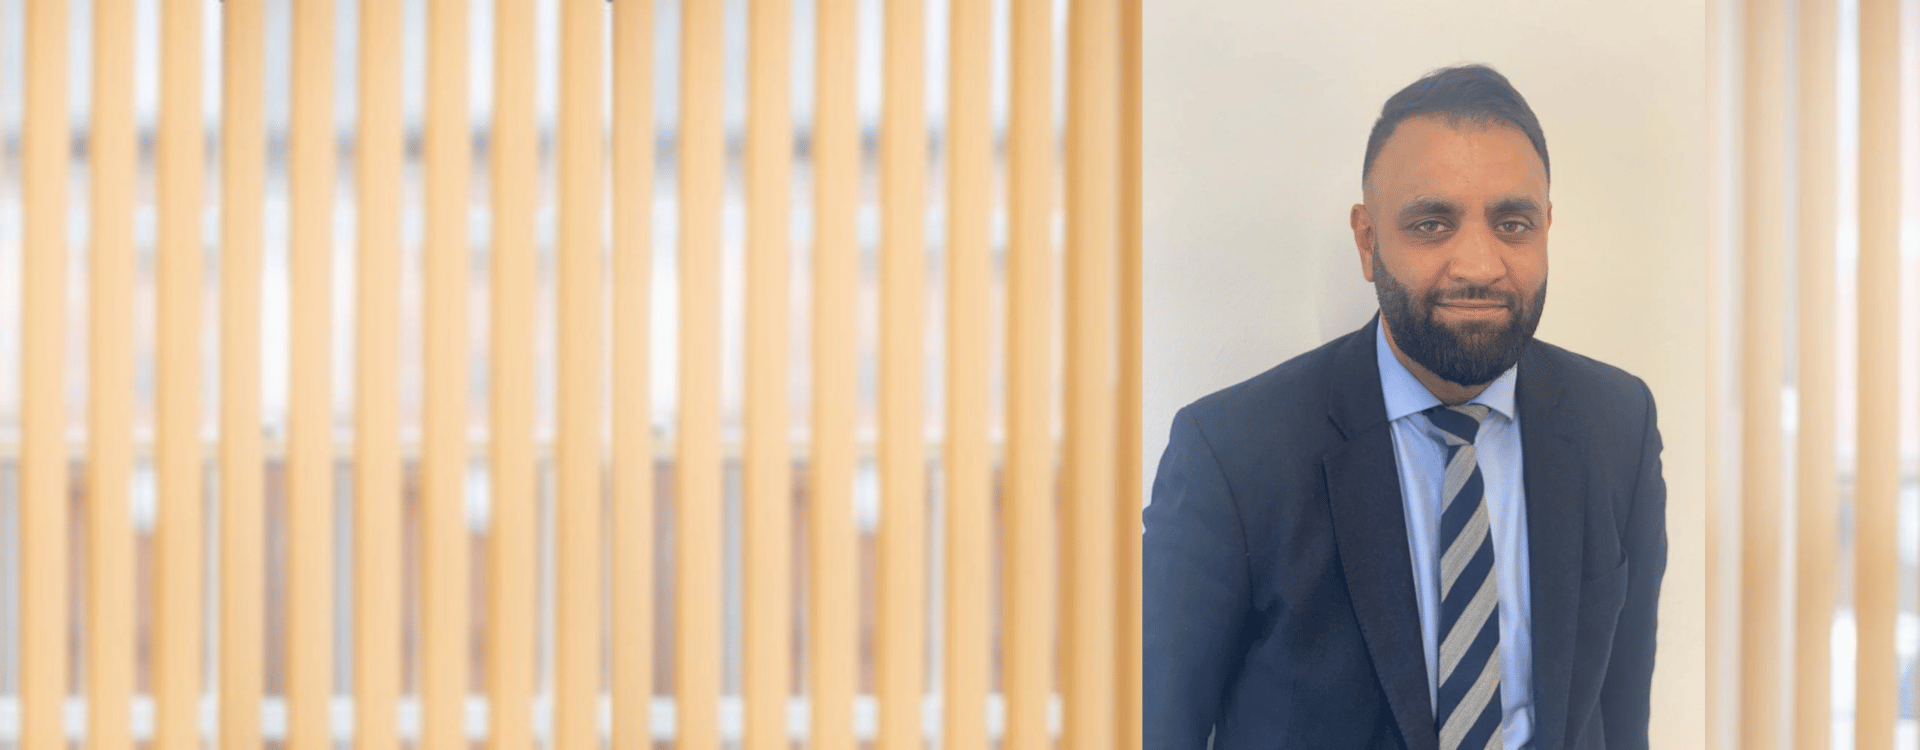 Harvey Gahir Criminal Defence Consultant Solicitor